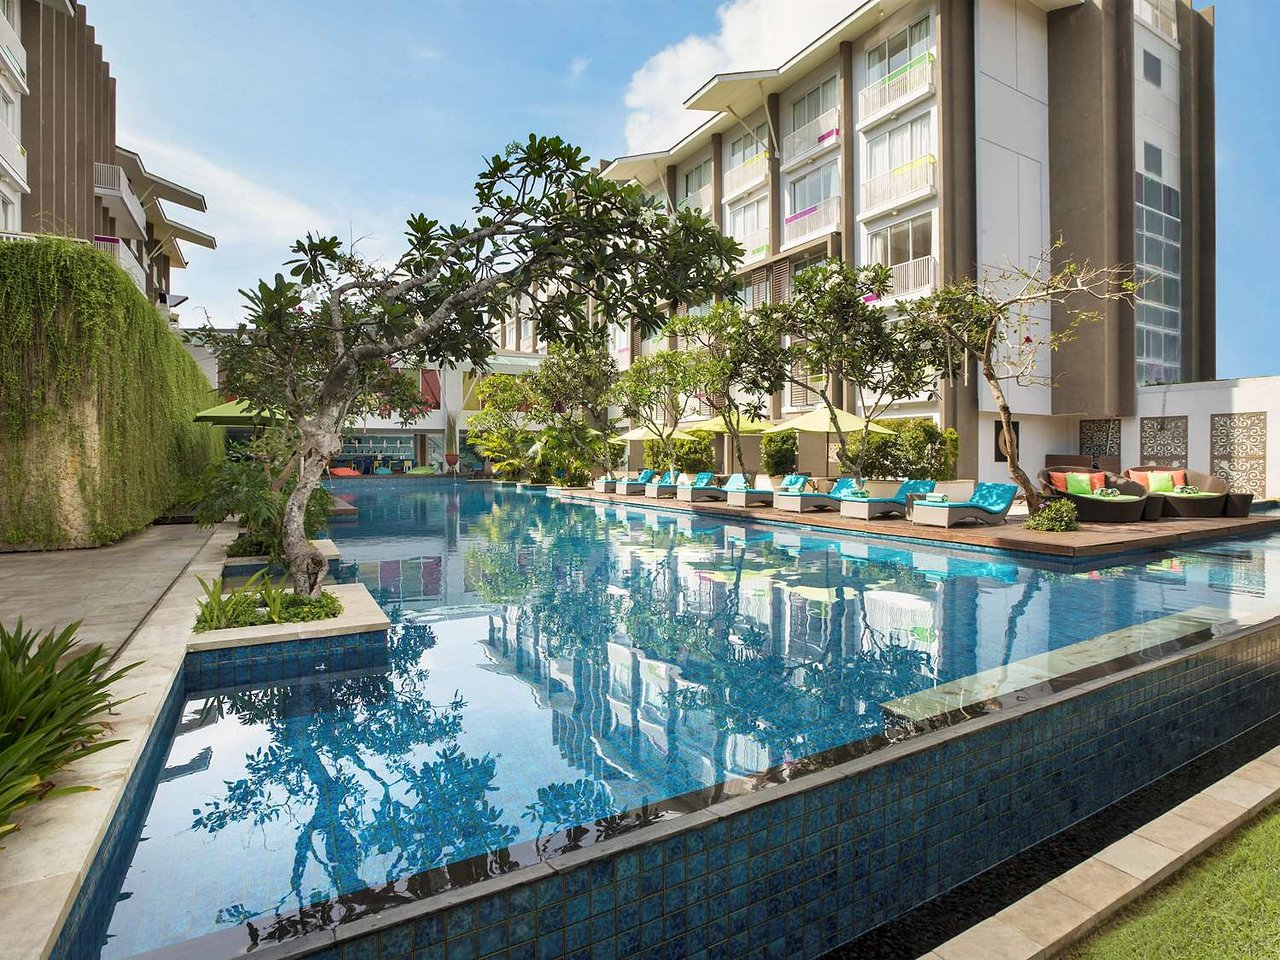 ibis styles bali benoa 30 3 7 updated 2019 prices hotel rh tripadvisor com